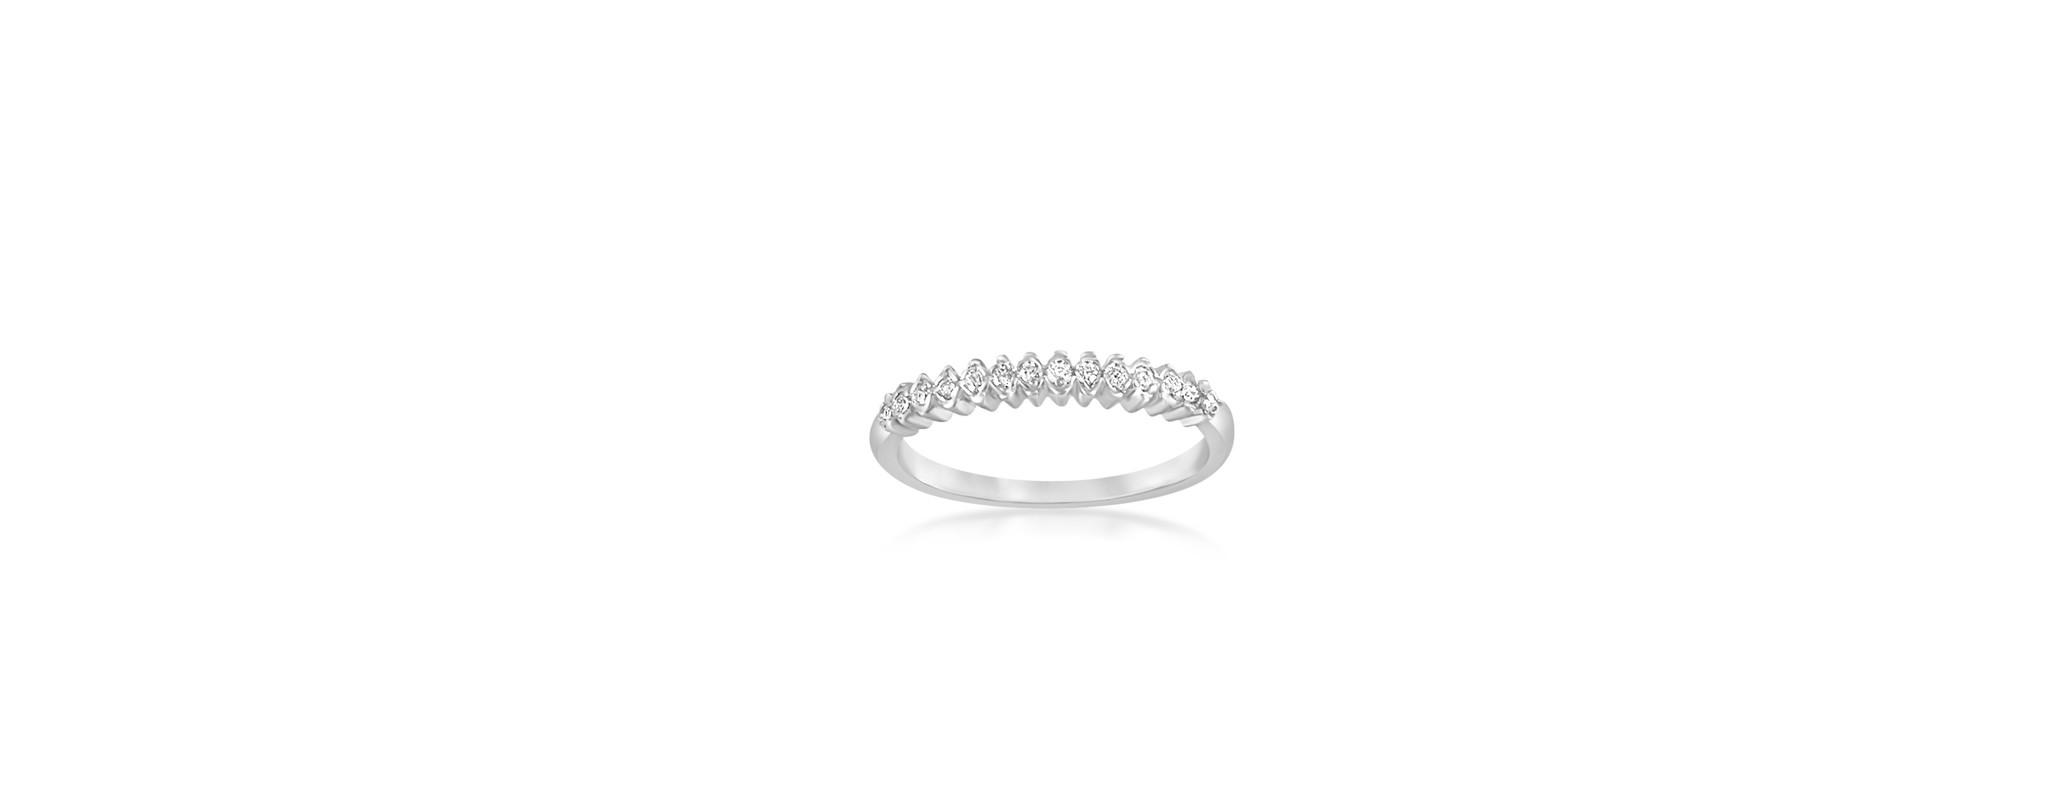 18 karaat wit goud ring met zirkonia